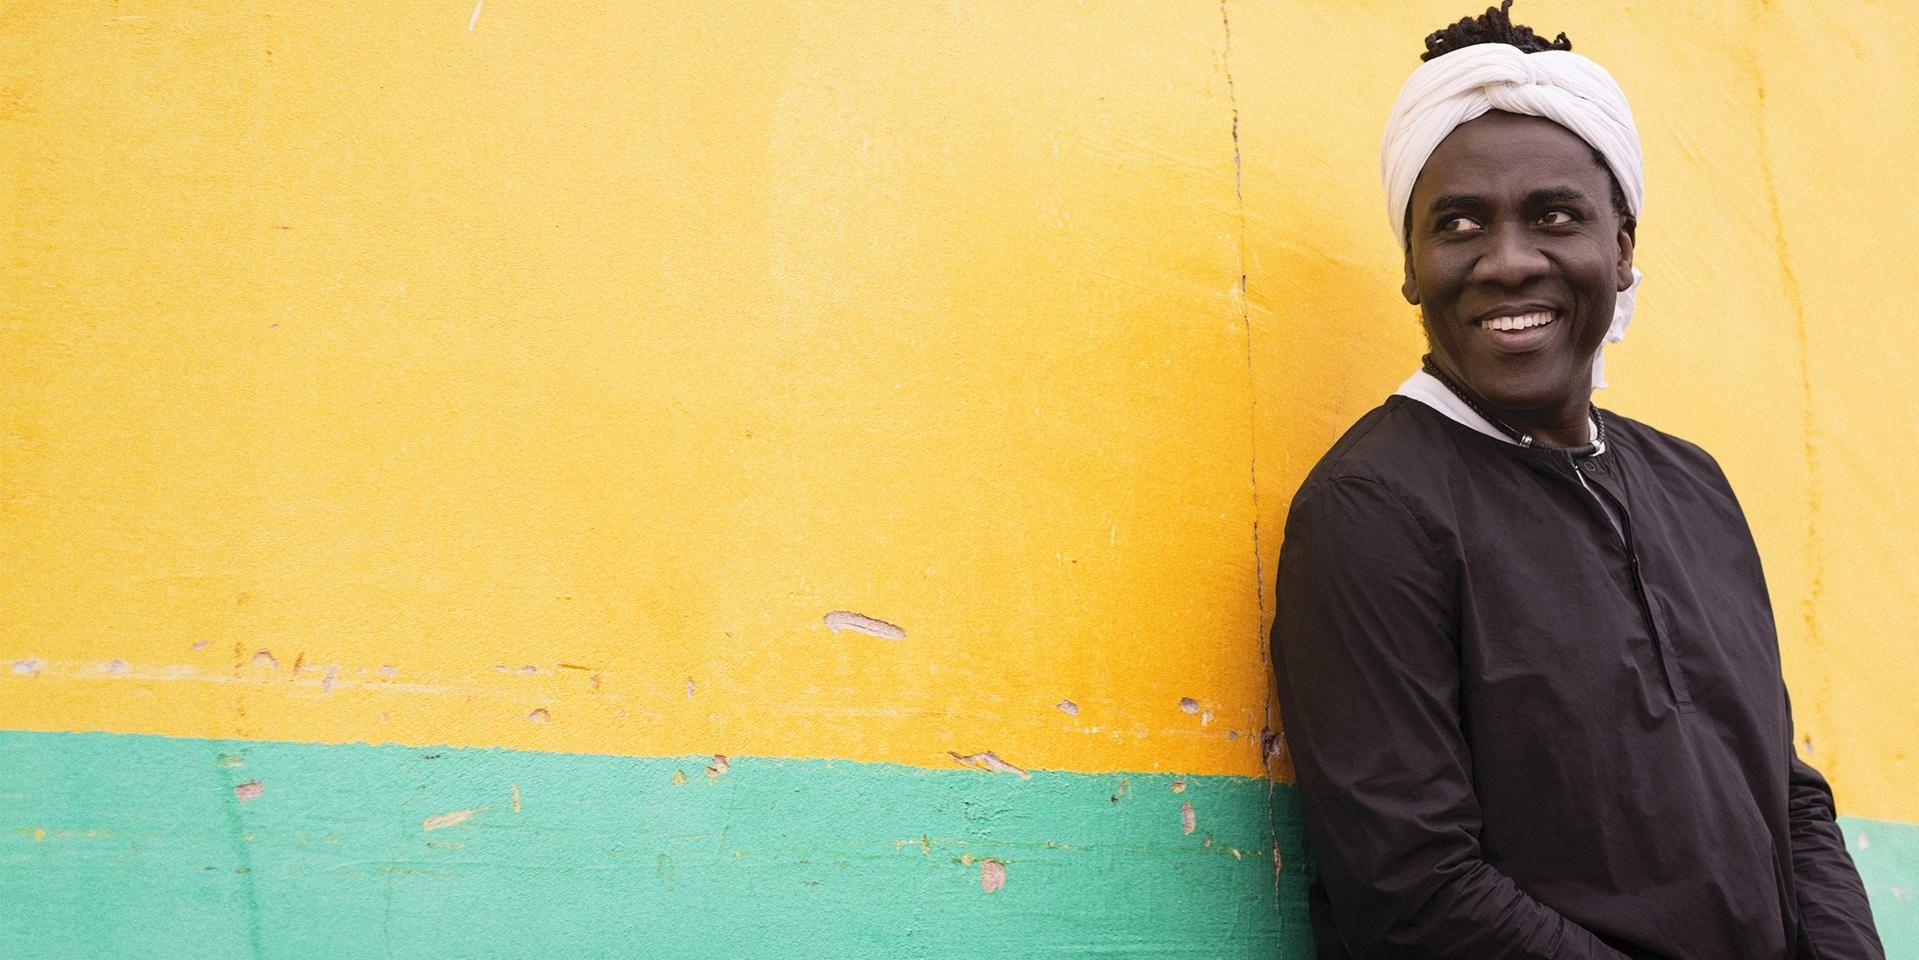 Grammy Award-winning Jazz bassist Richard Bona to perform in Singapore